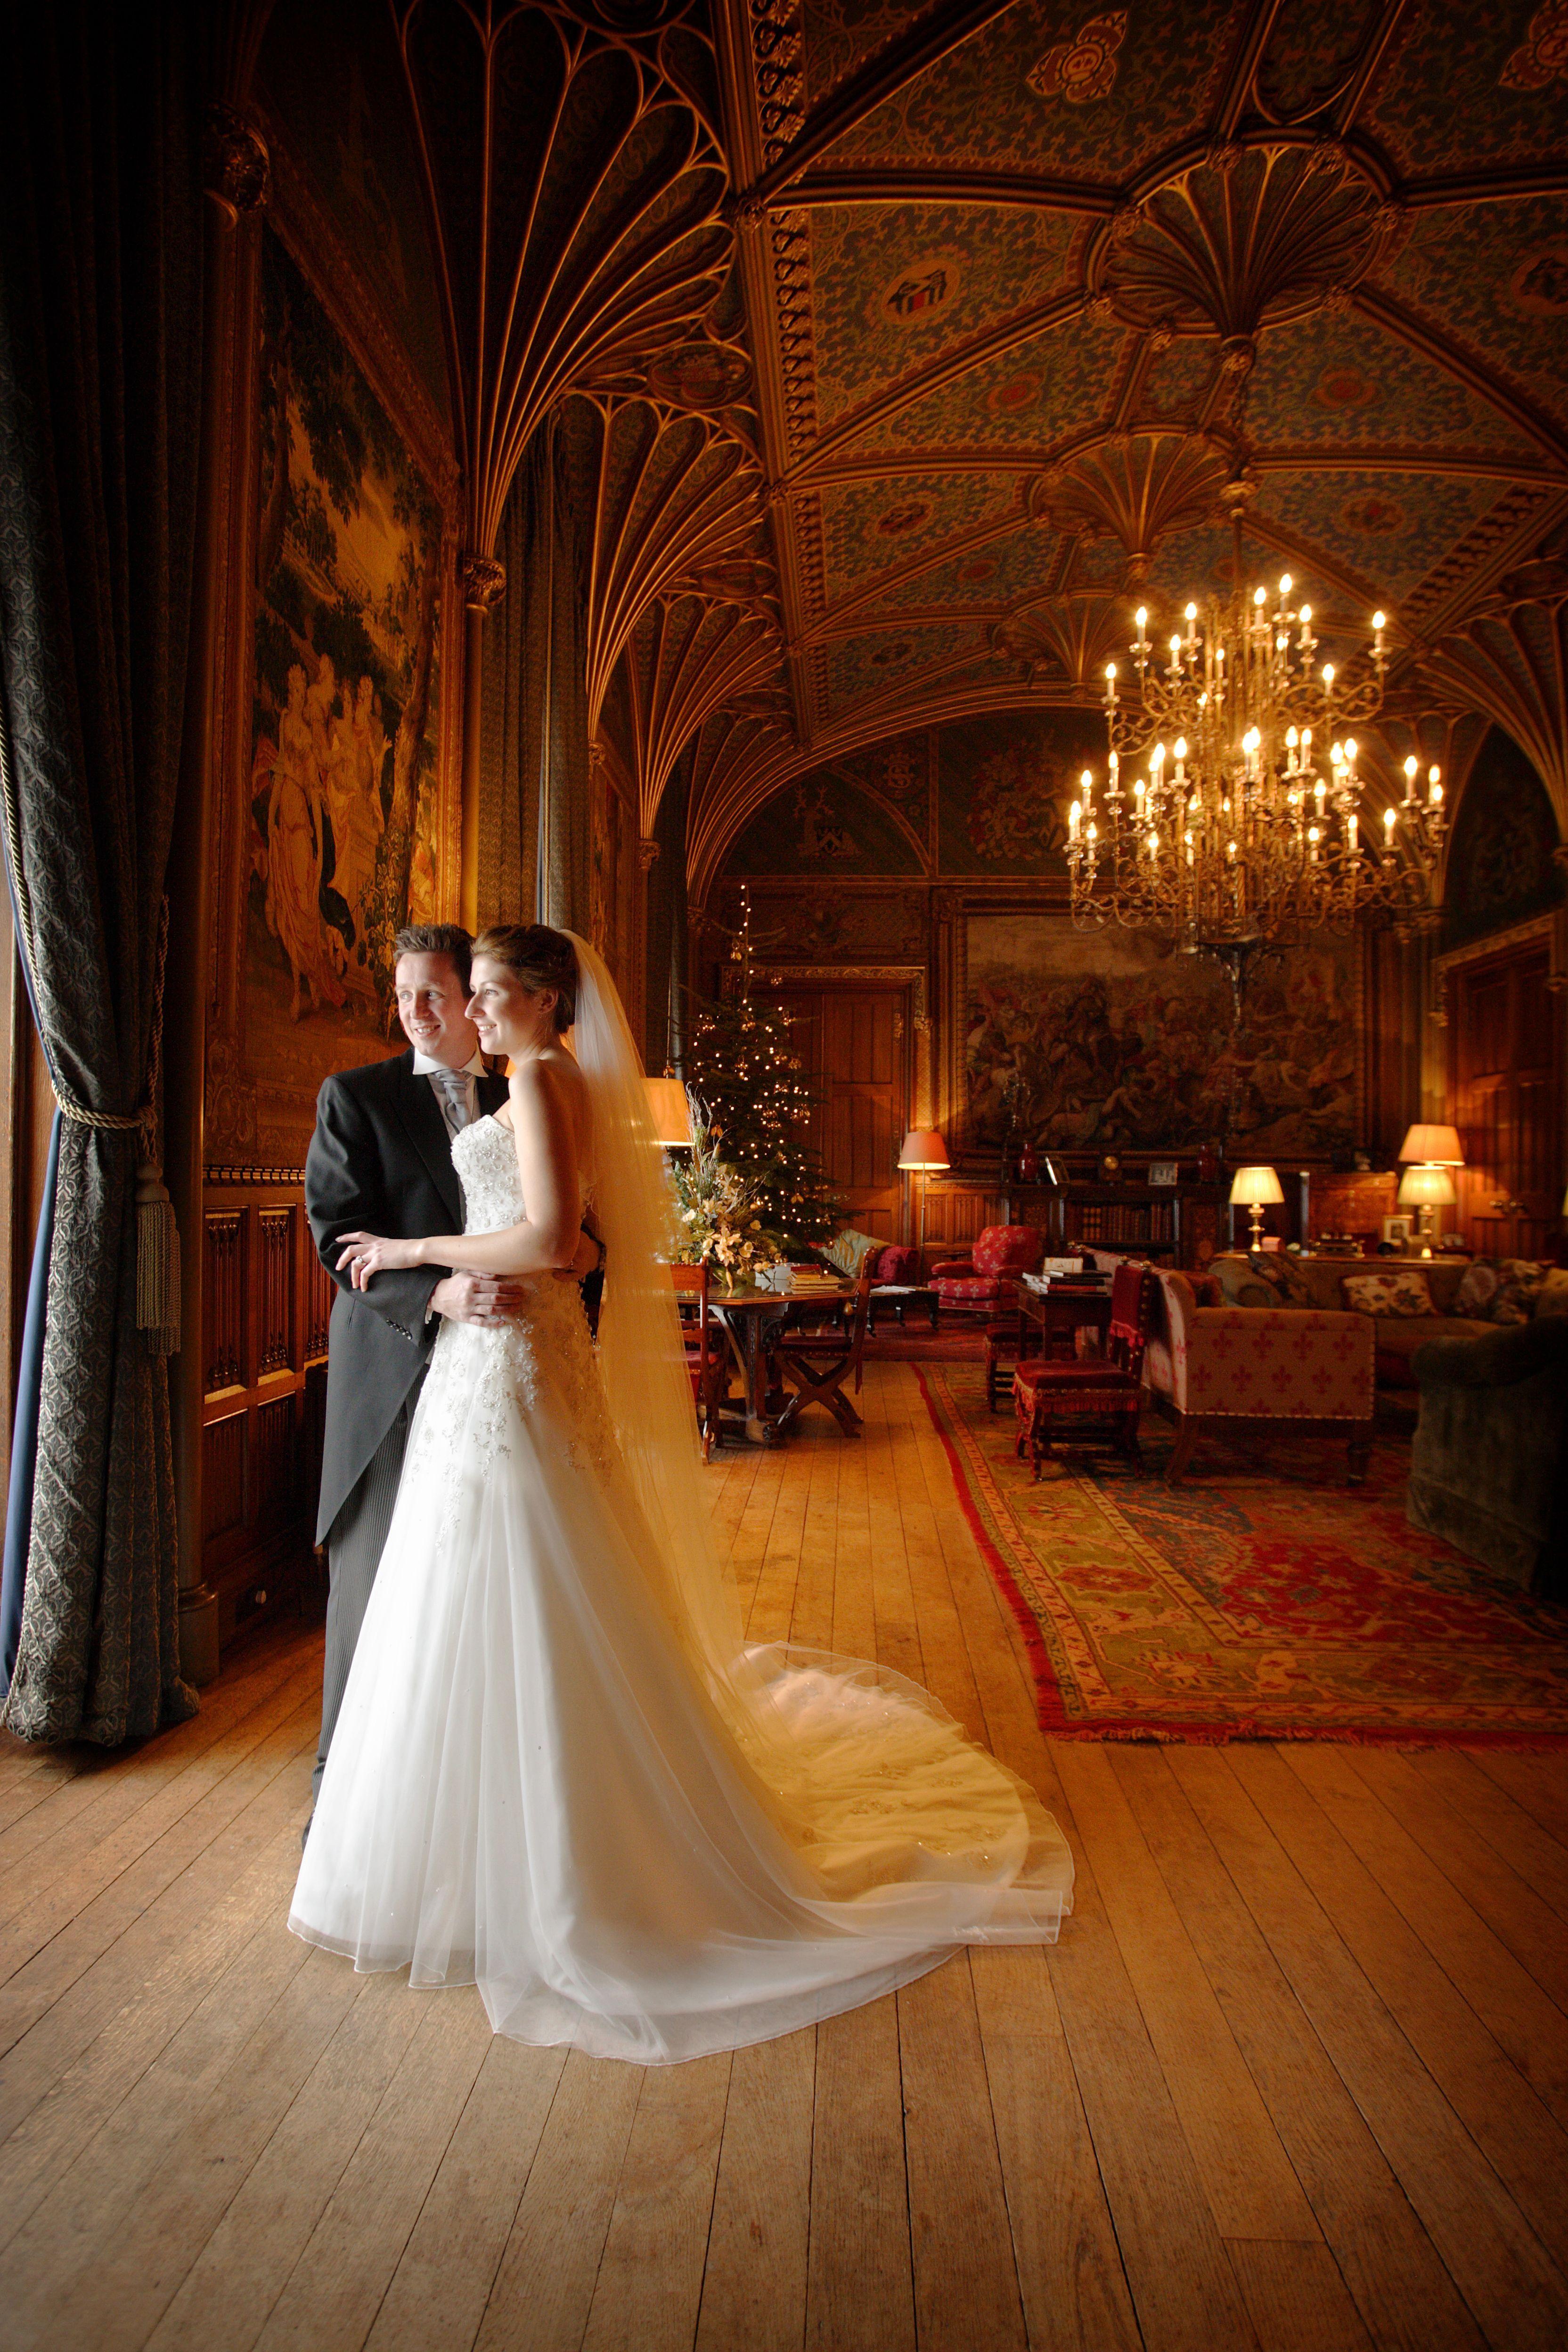 A Christmas Wedding at Eastnor Castle www.eastnorcastle ...